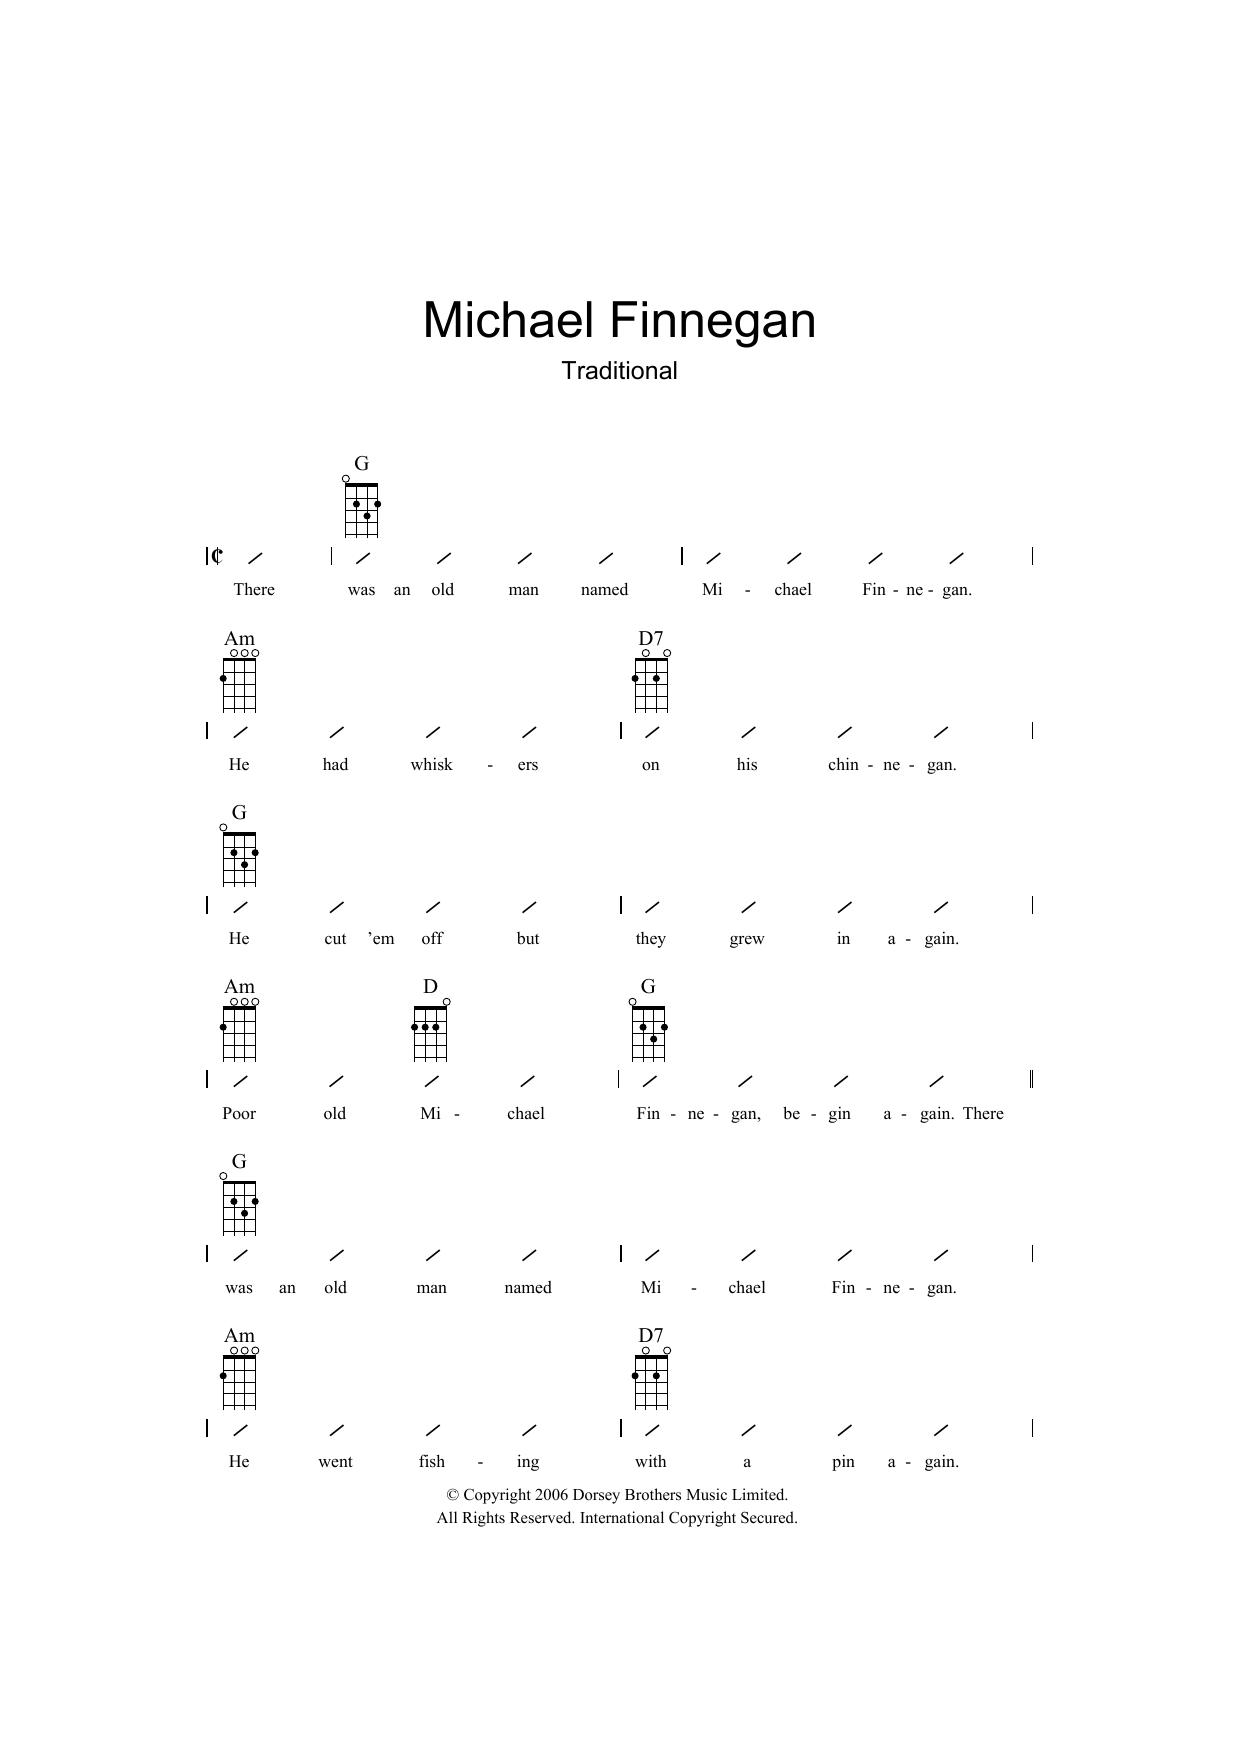 Michael Finnegan (Ukulele Chords/Lyrics)